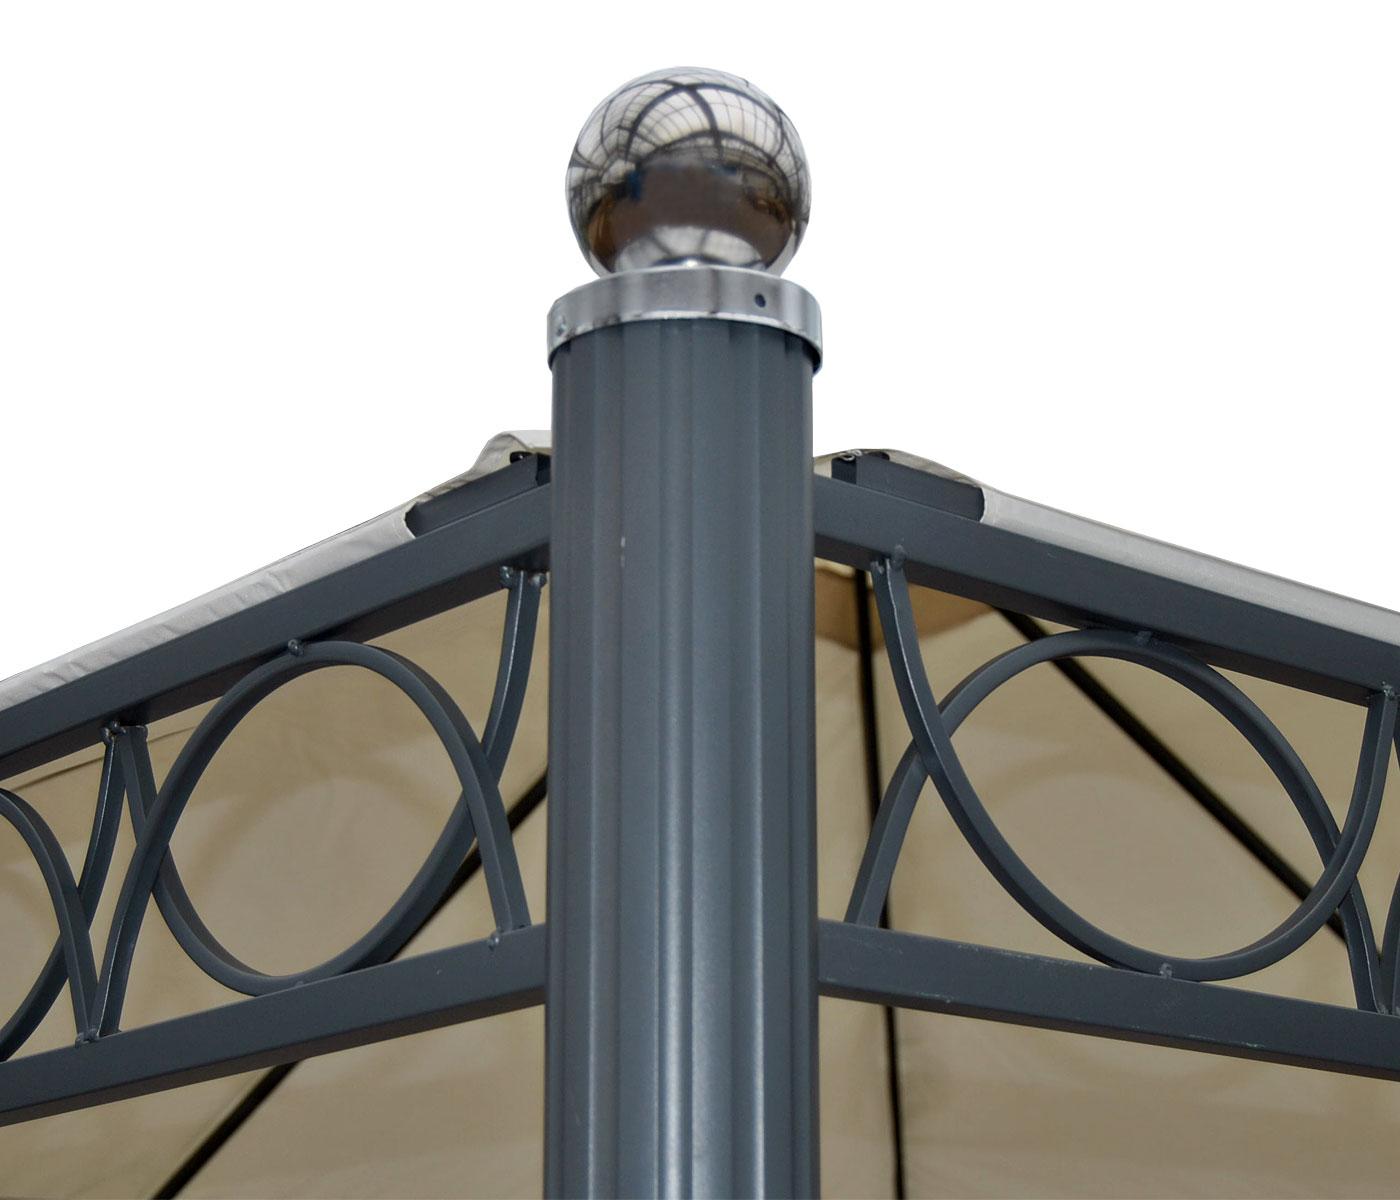 pergola belagua, garten pavillon, stabiles 10cm luxus-alu-gestell, Badezimmer ideen